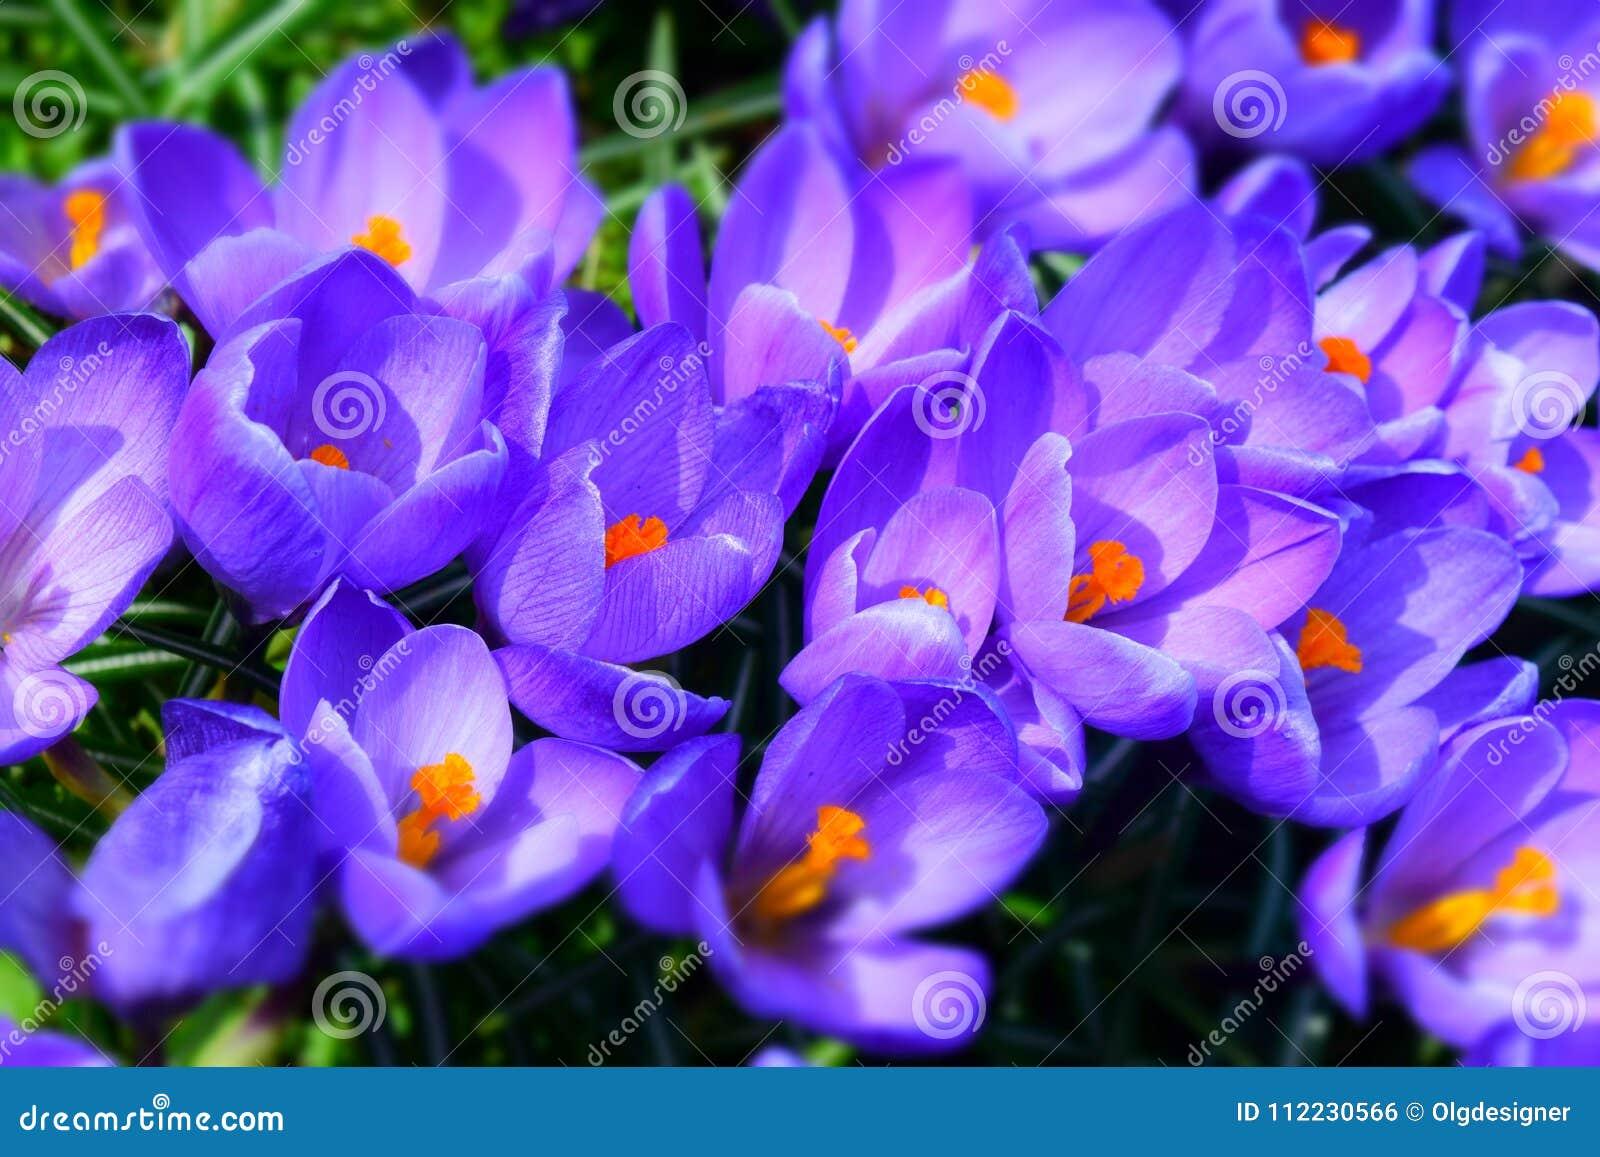 Bright ultra violet crocuses flowers